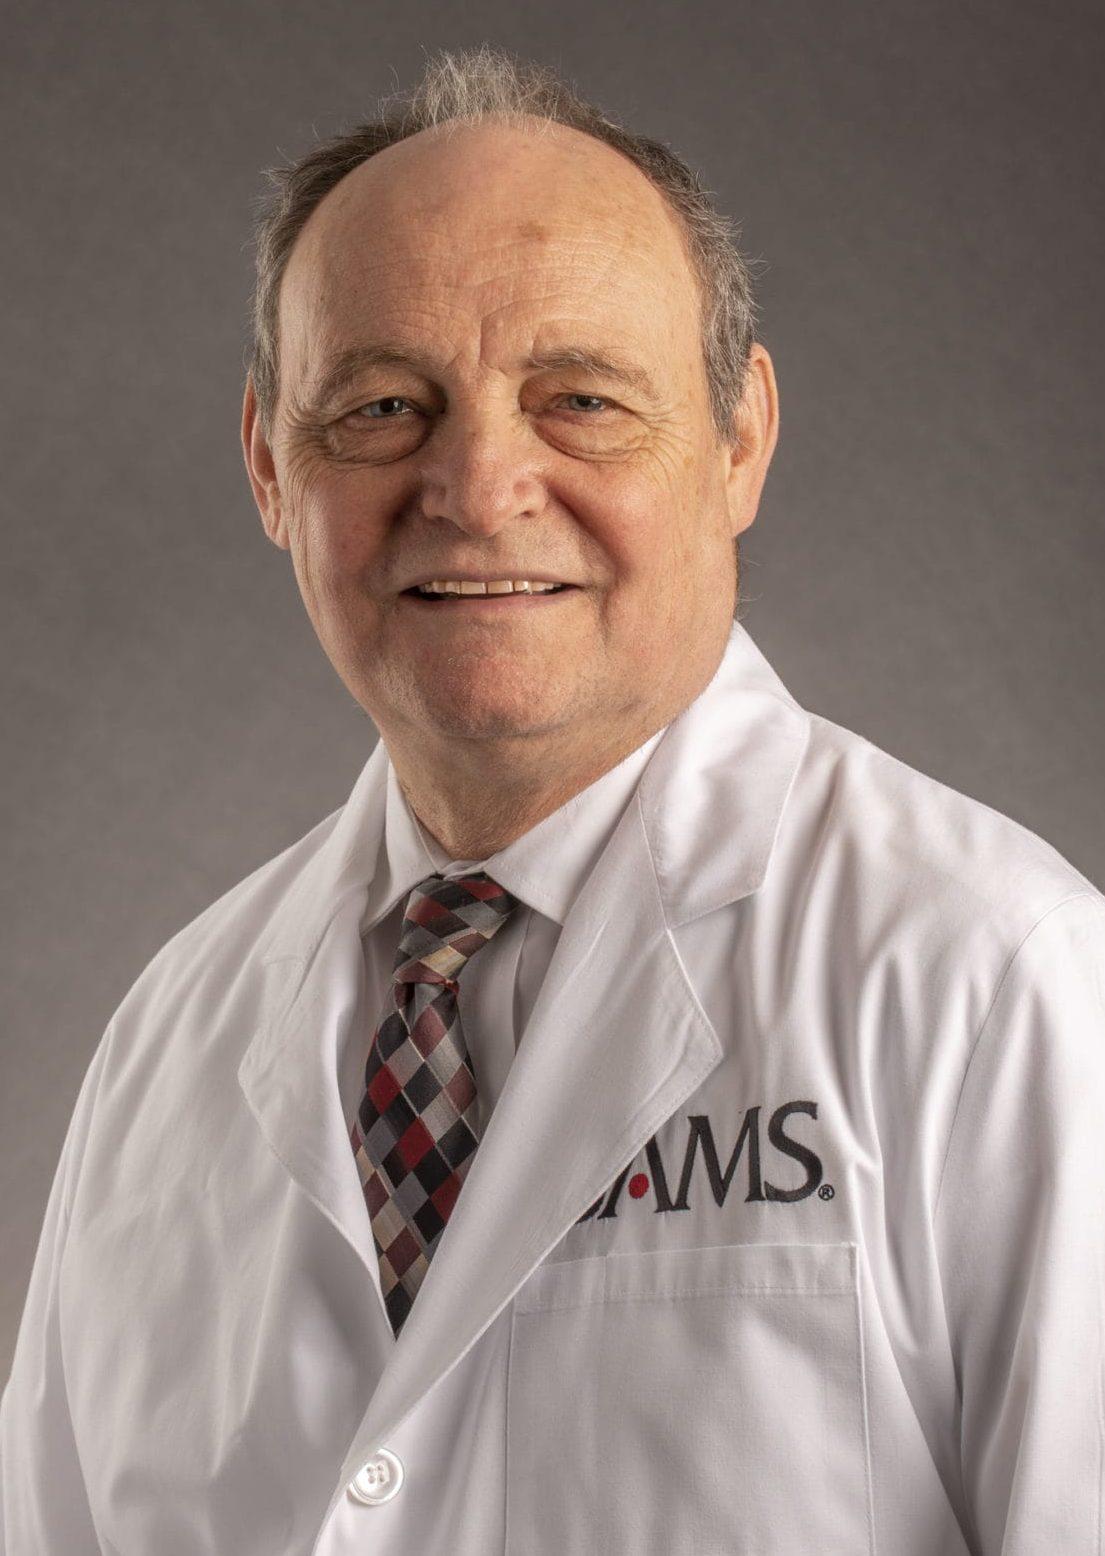 Dr. Michael Birrer